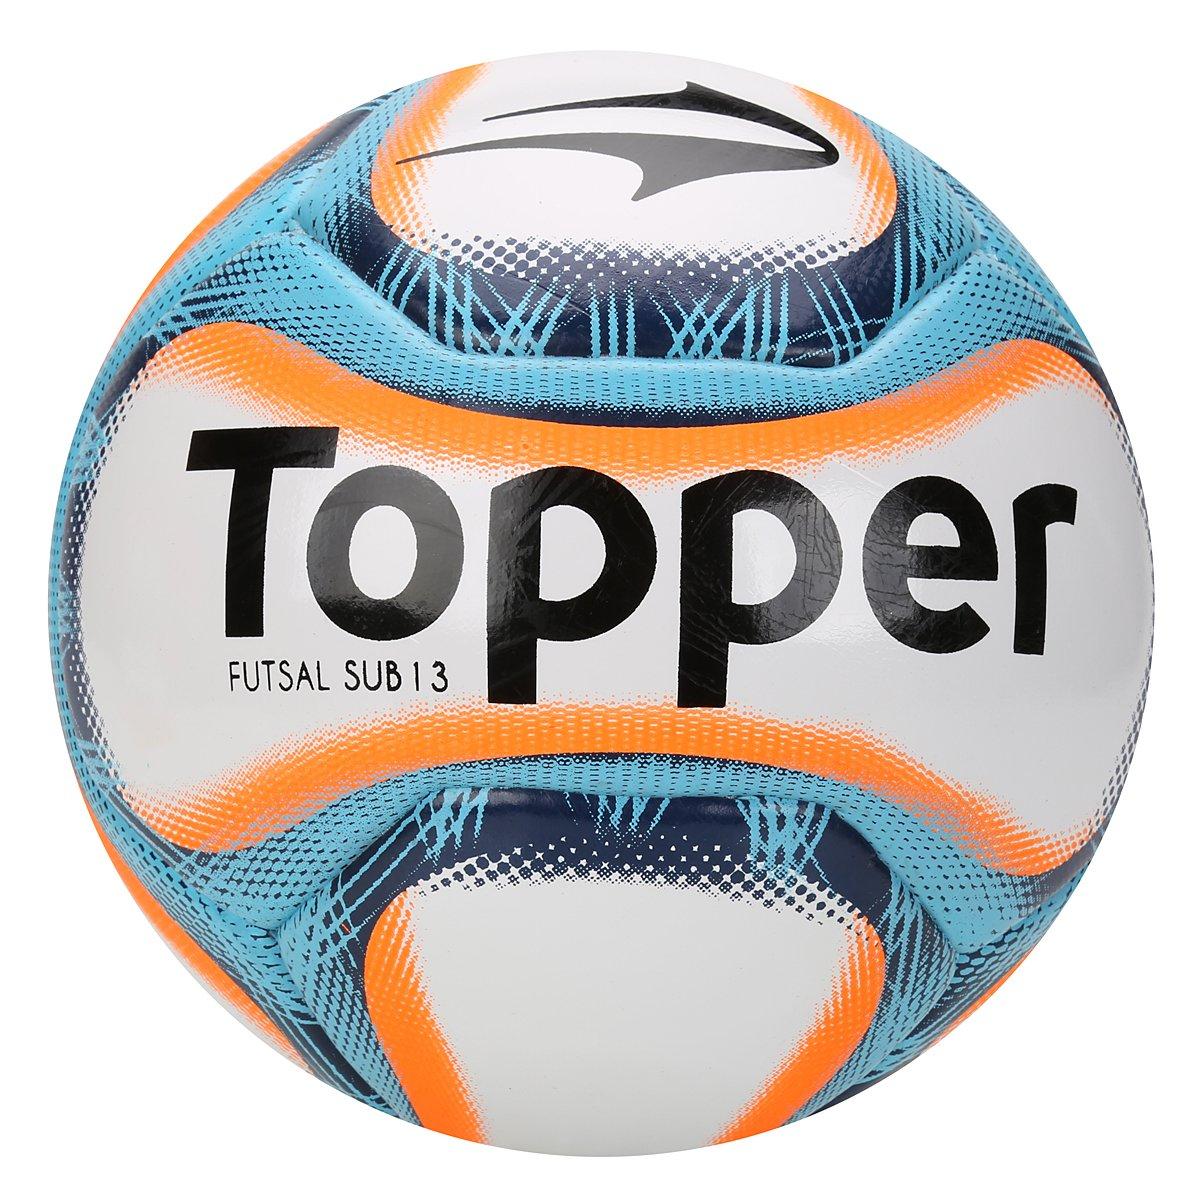 Bola Futebol Topper Sub13 Fusionada Futsal - Compre Agora  a6fd7627208a8